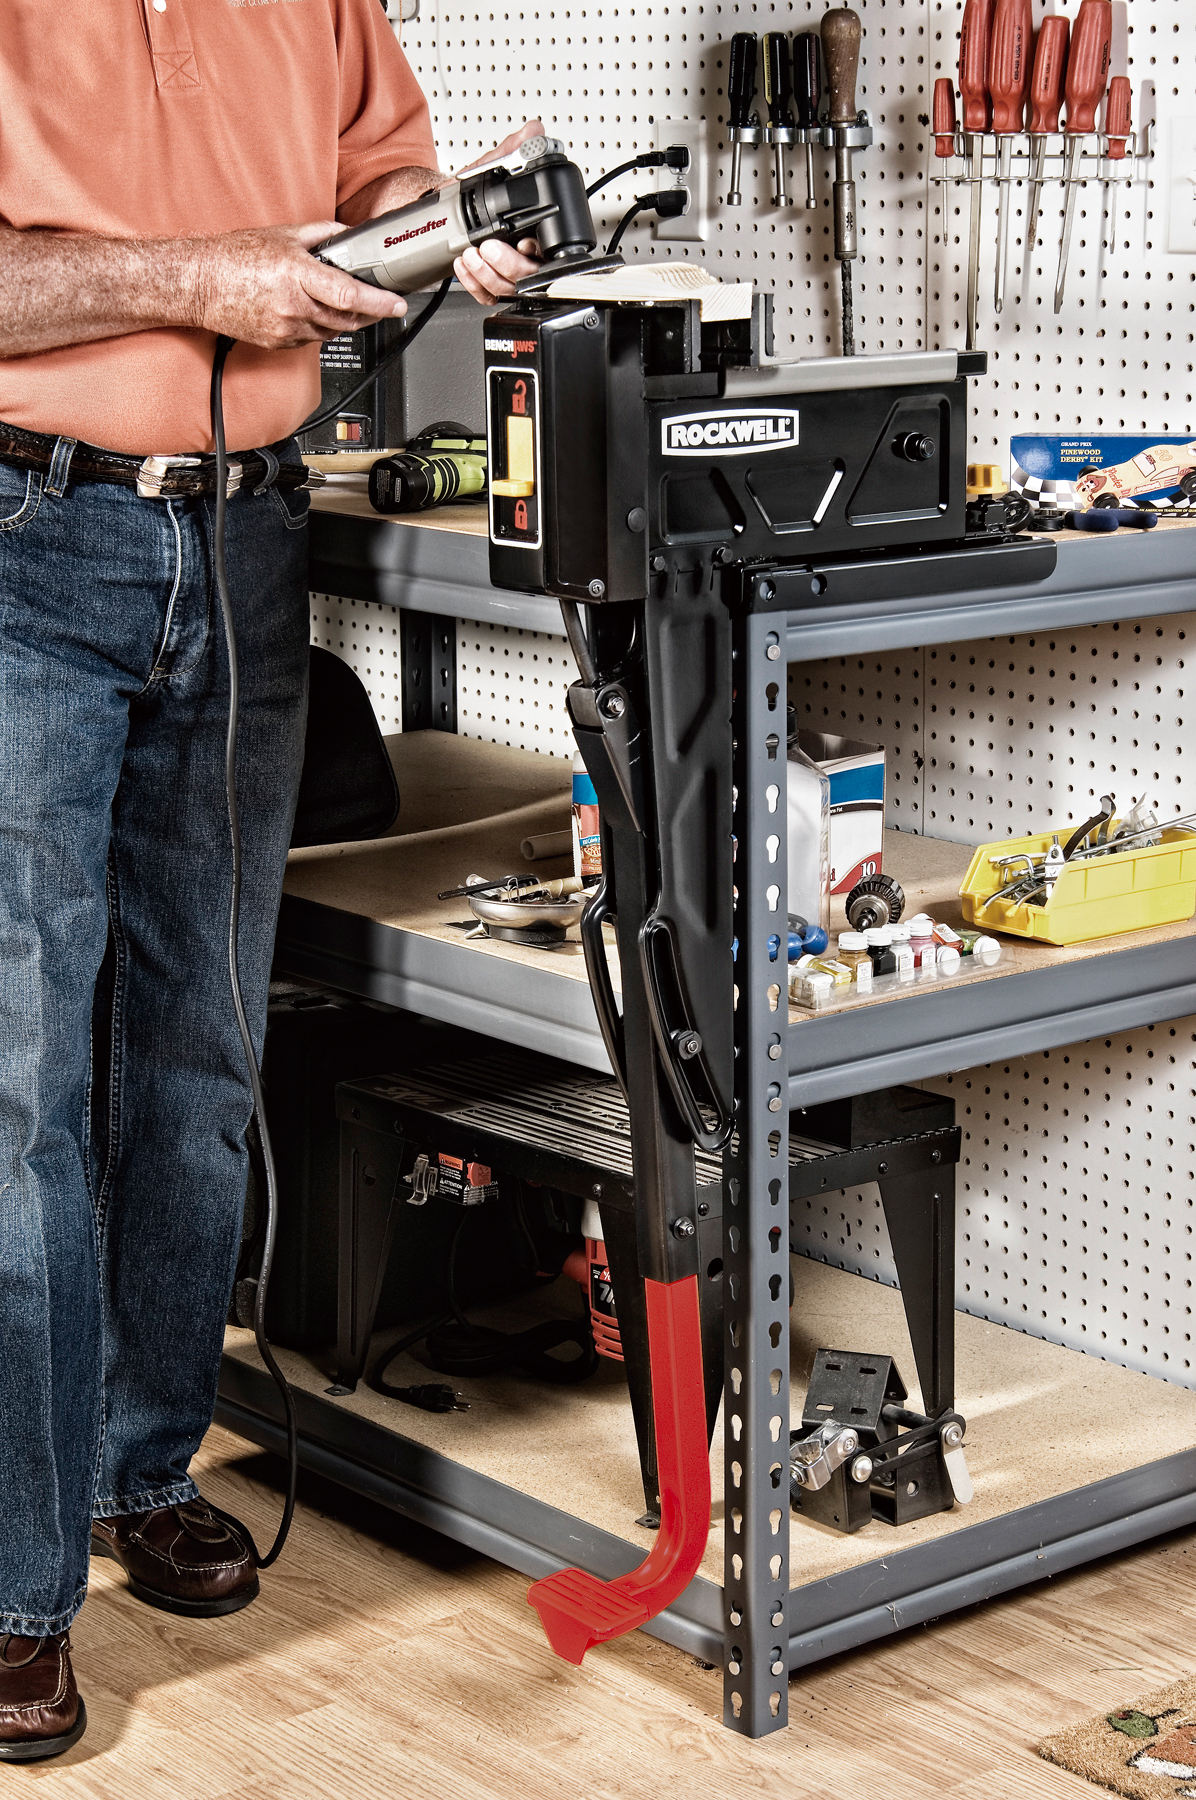 New Rockwell Benchjaws Joins Tools That Make Sense